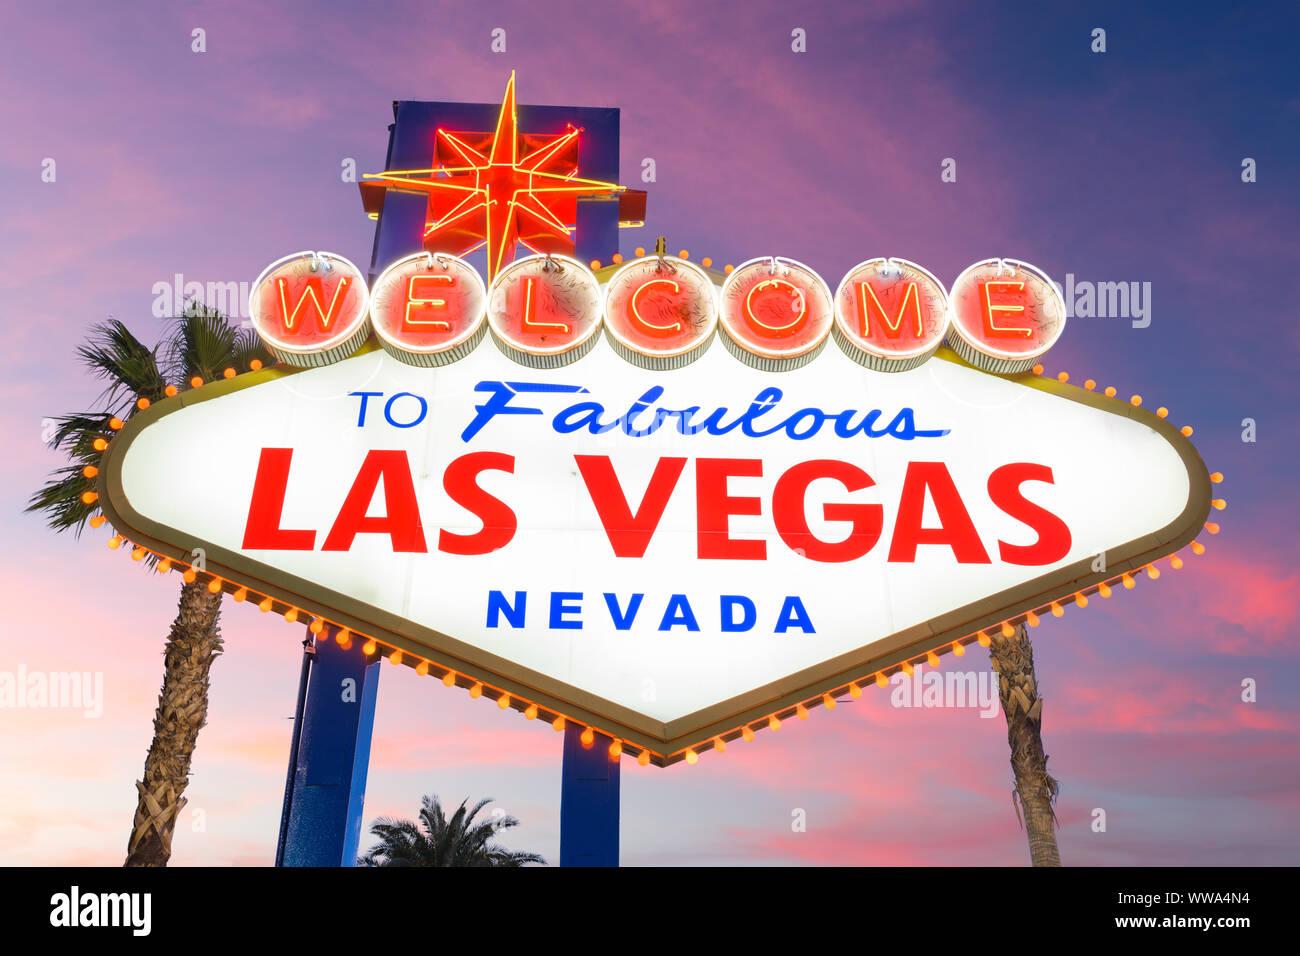 Las Vegas, Nevada, USA at the Welcome to Las Vegas Sign. Stock Photo